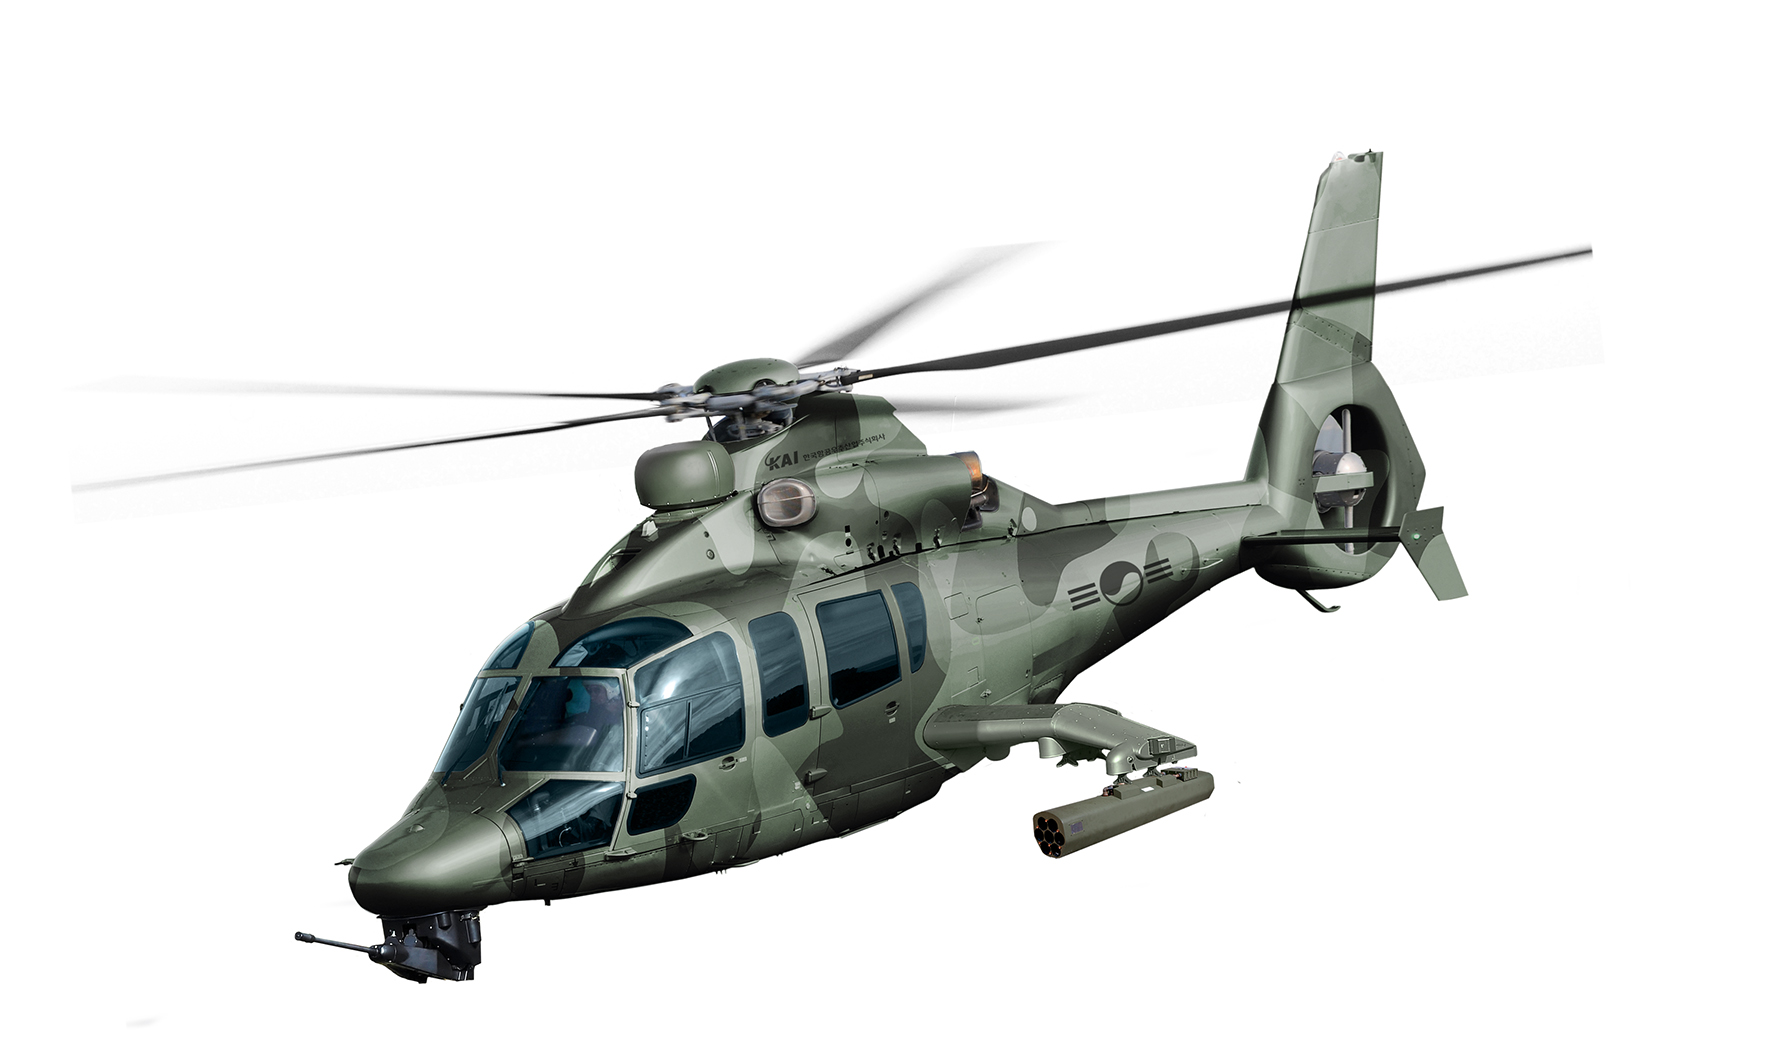 Fotos 1 e 2 AirbusHelicopters-Korea Aerospace .